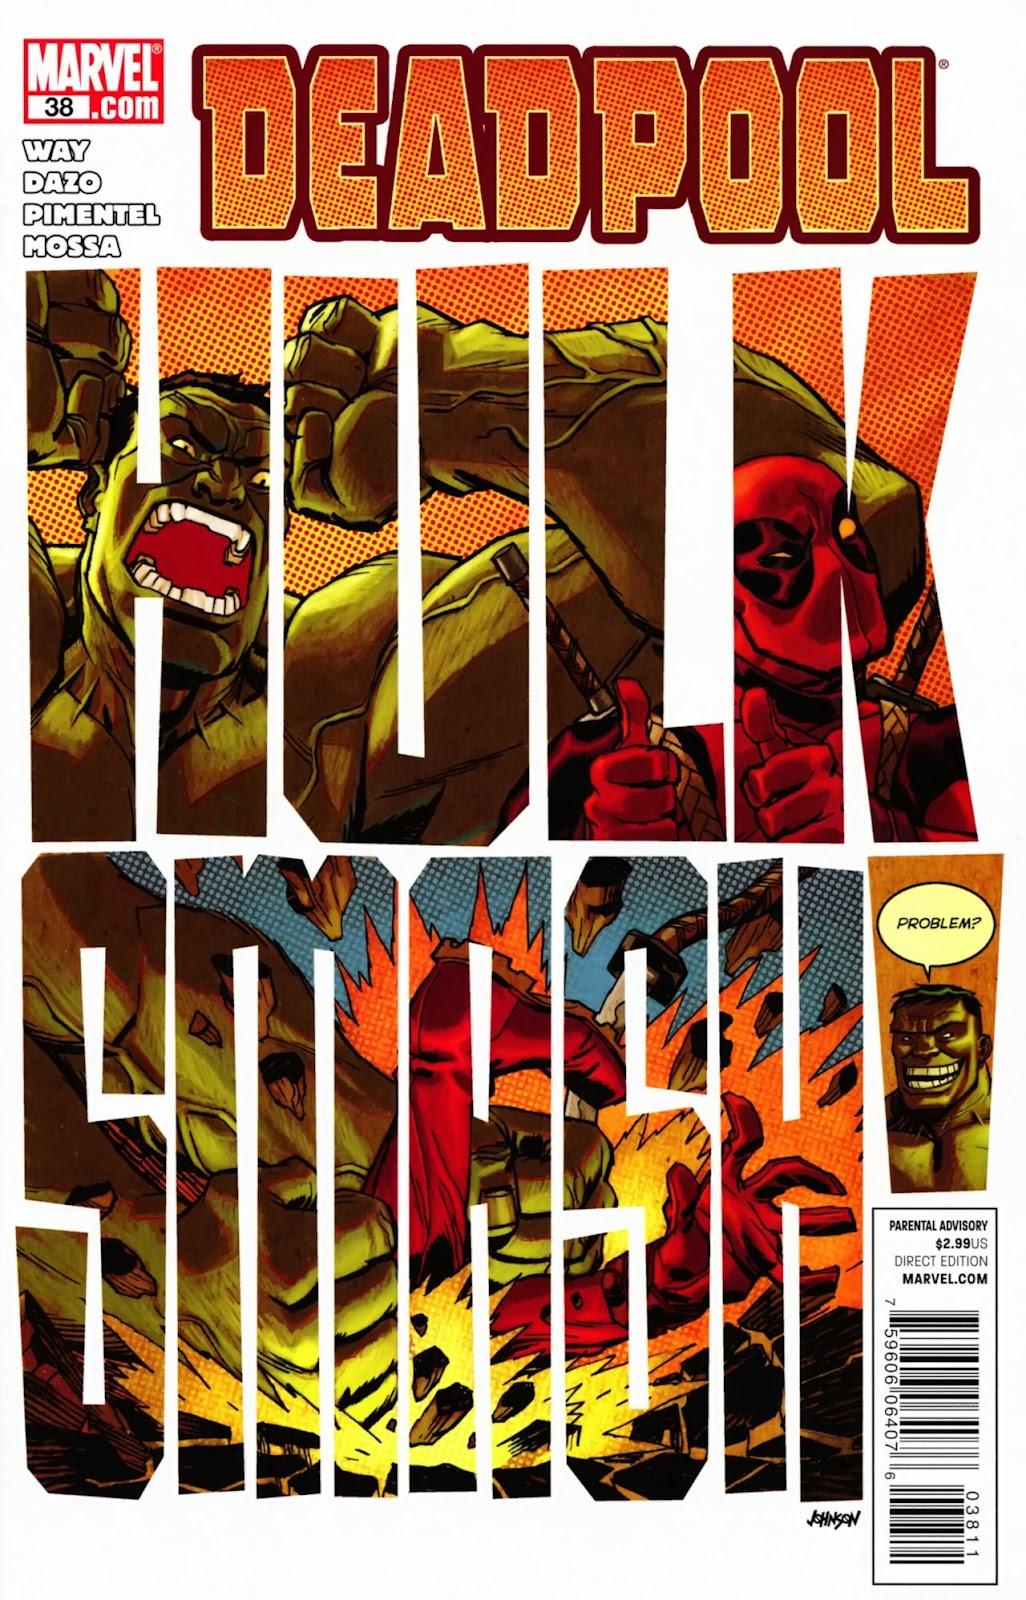 Read online Deadpool (2008) comic -  Issue #38 - 1